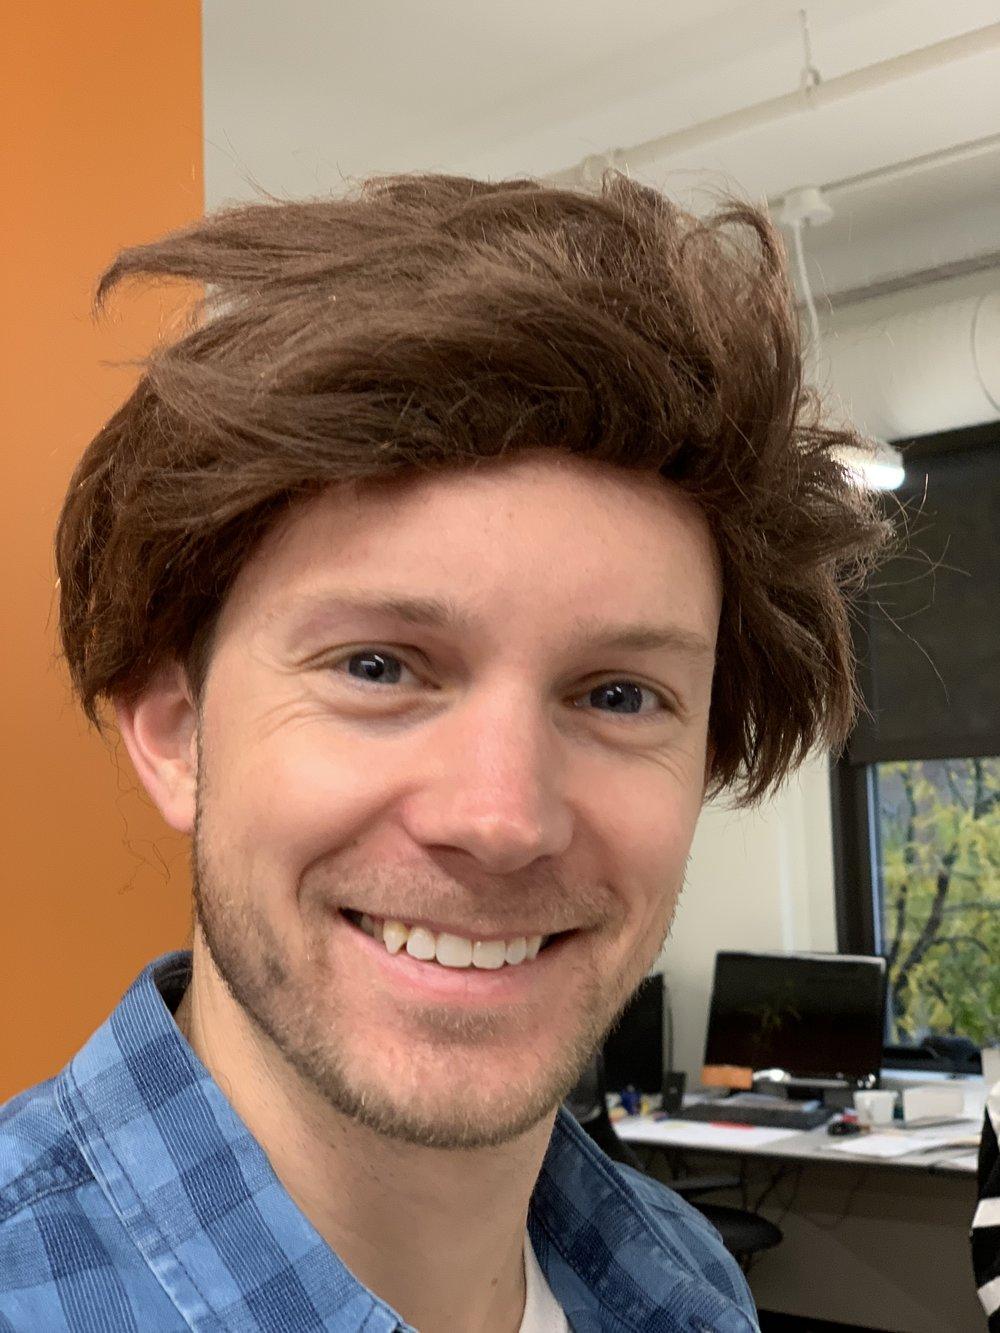 Our Lumberjack Adam [sans beard]